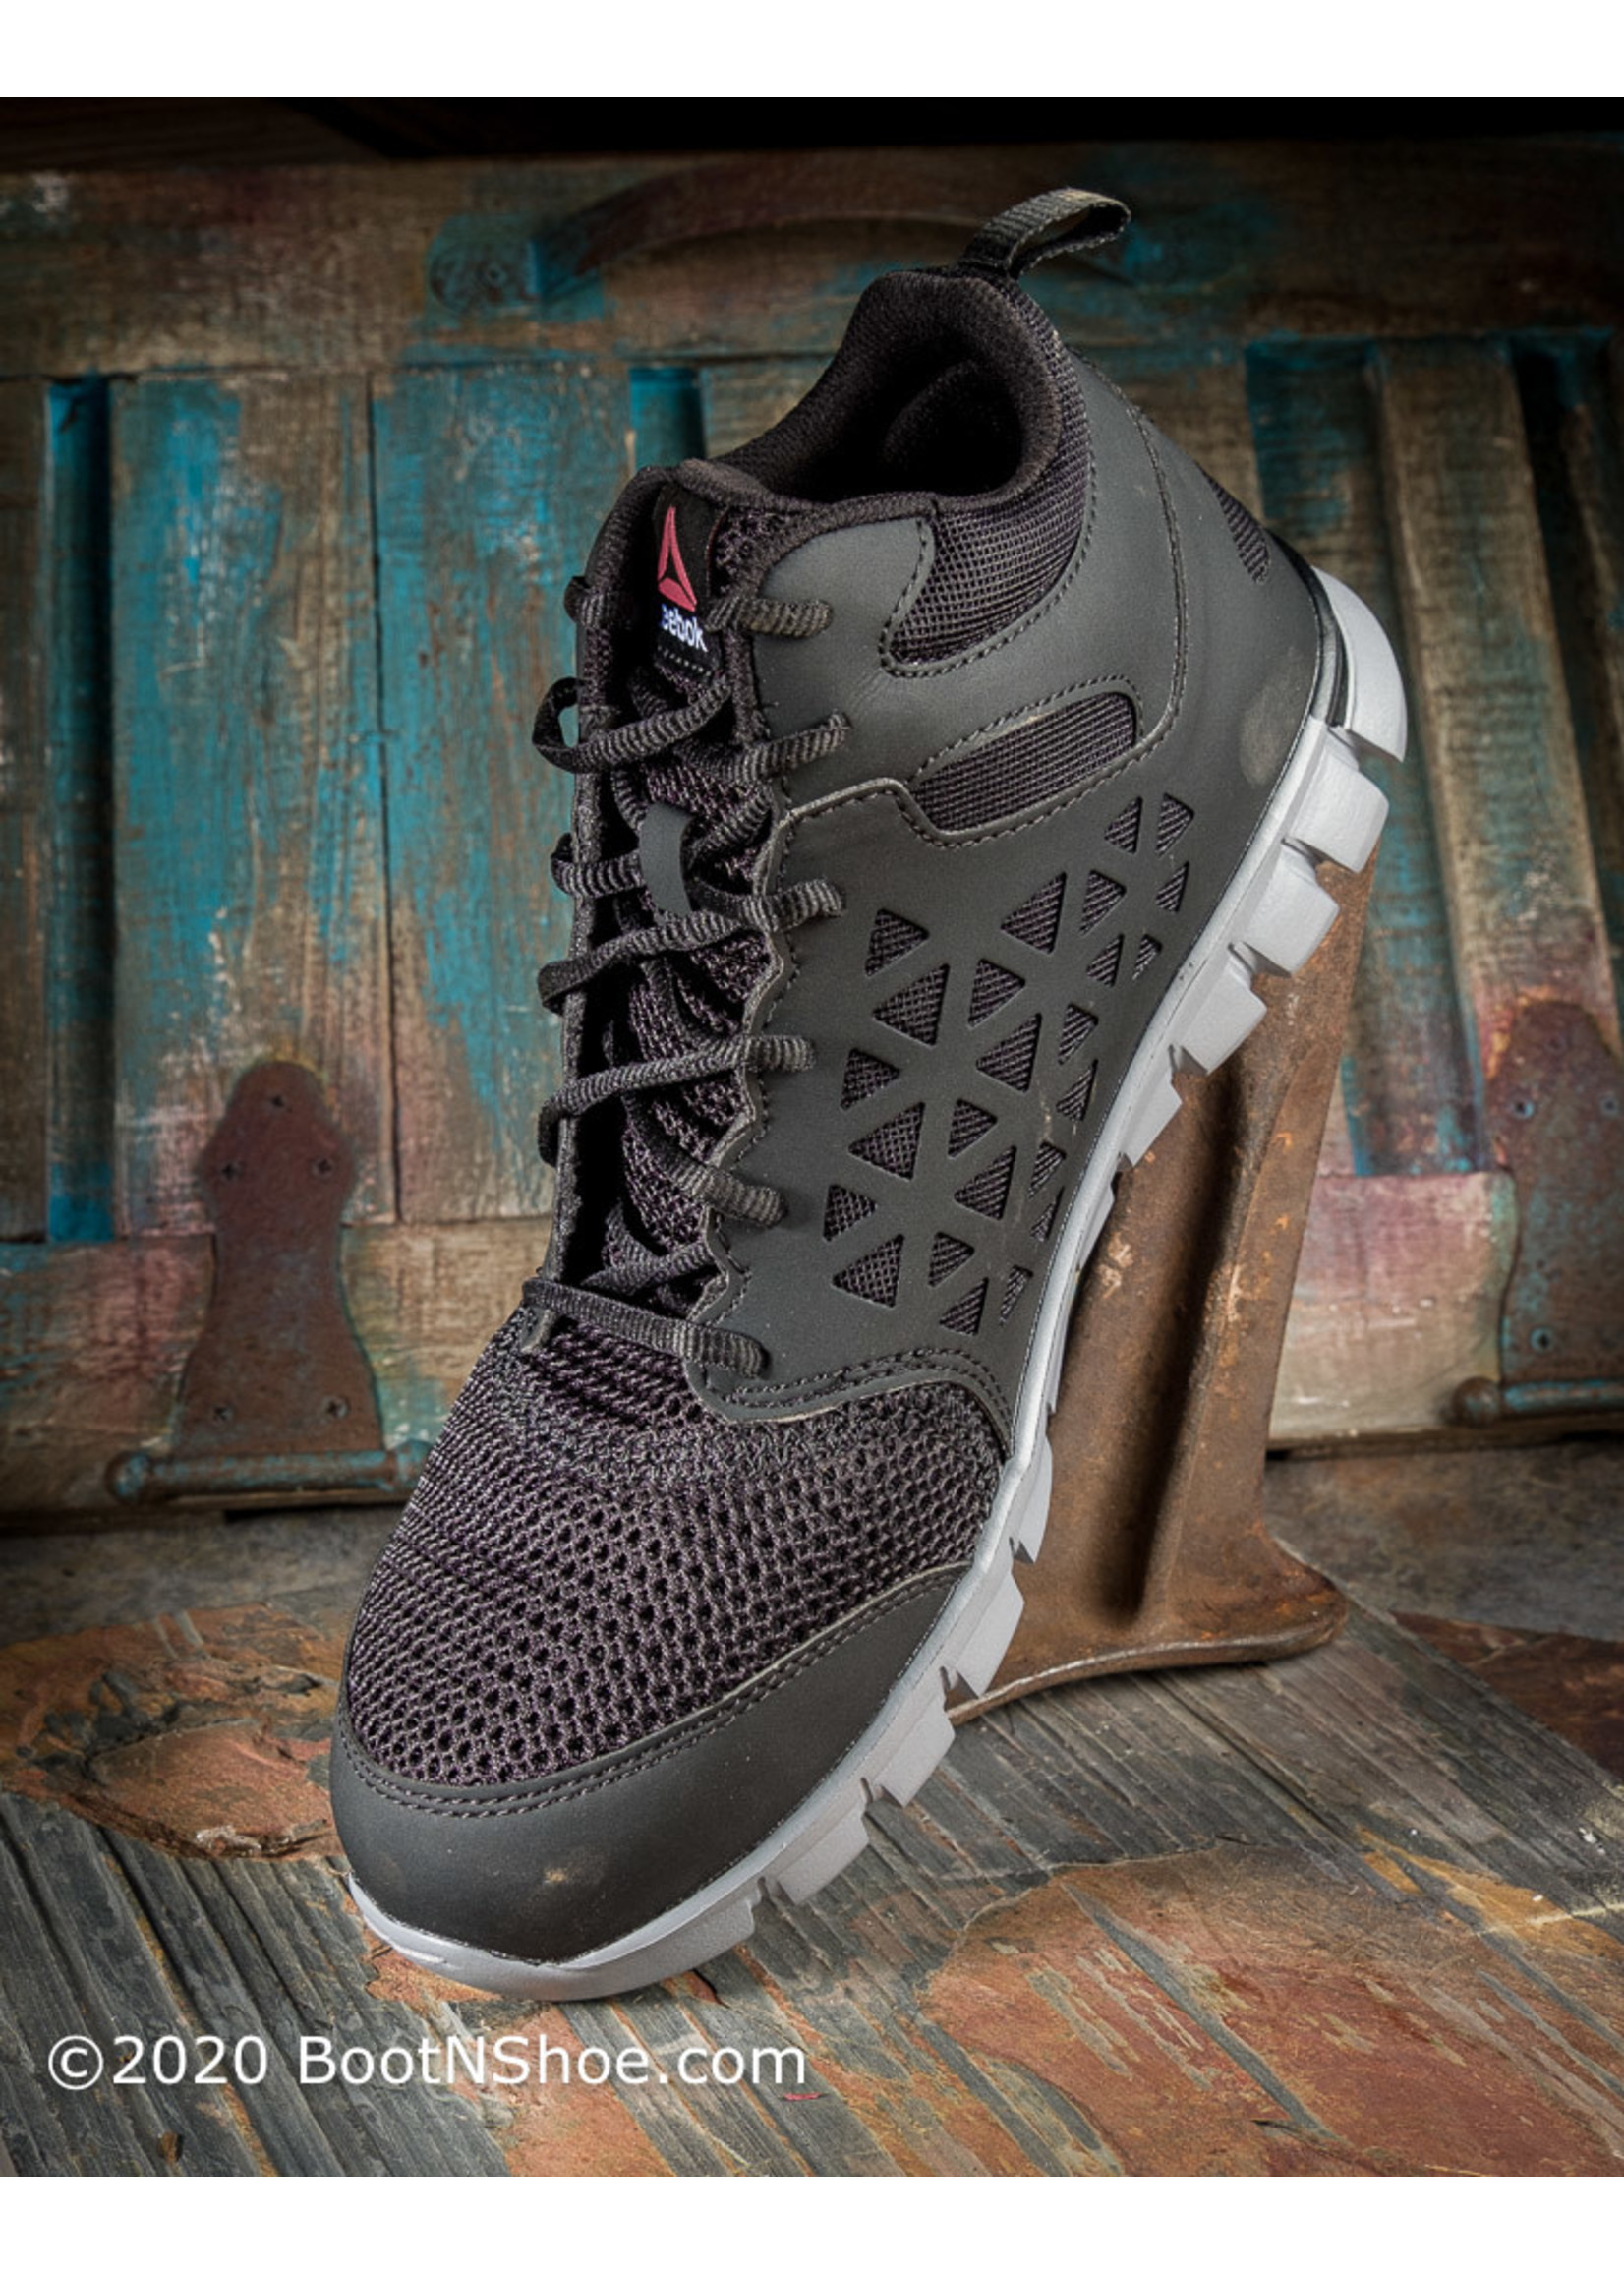 Reebok Men's Sublite Cushion Athletic Mid Cut Alloy Work Shoe RB4141